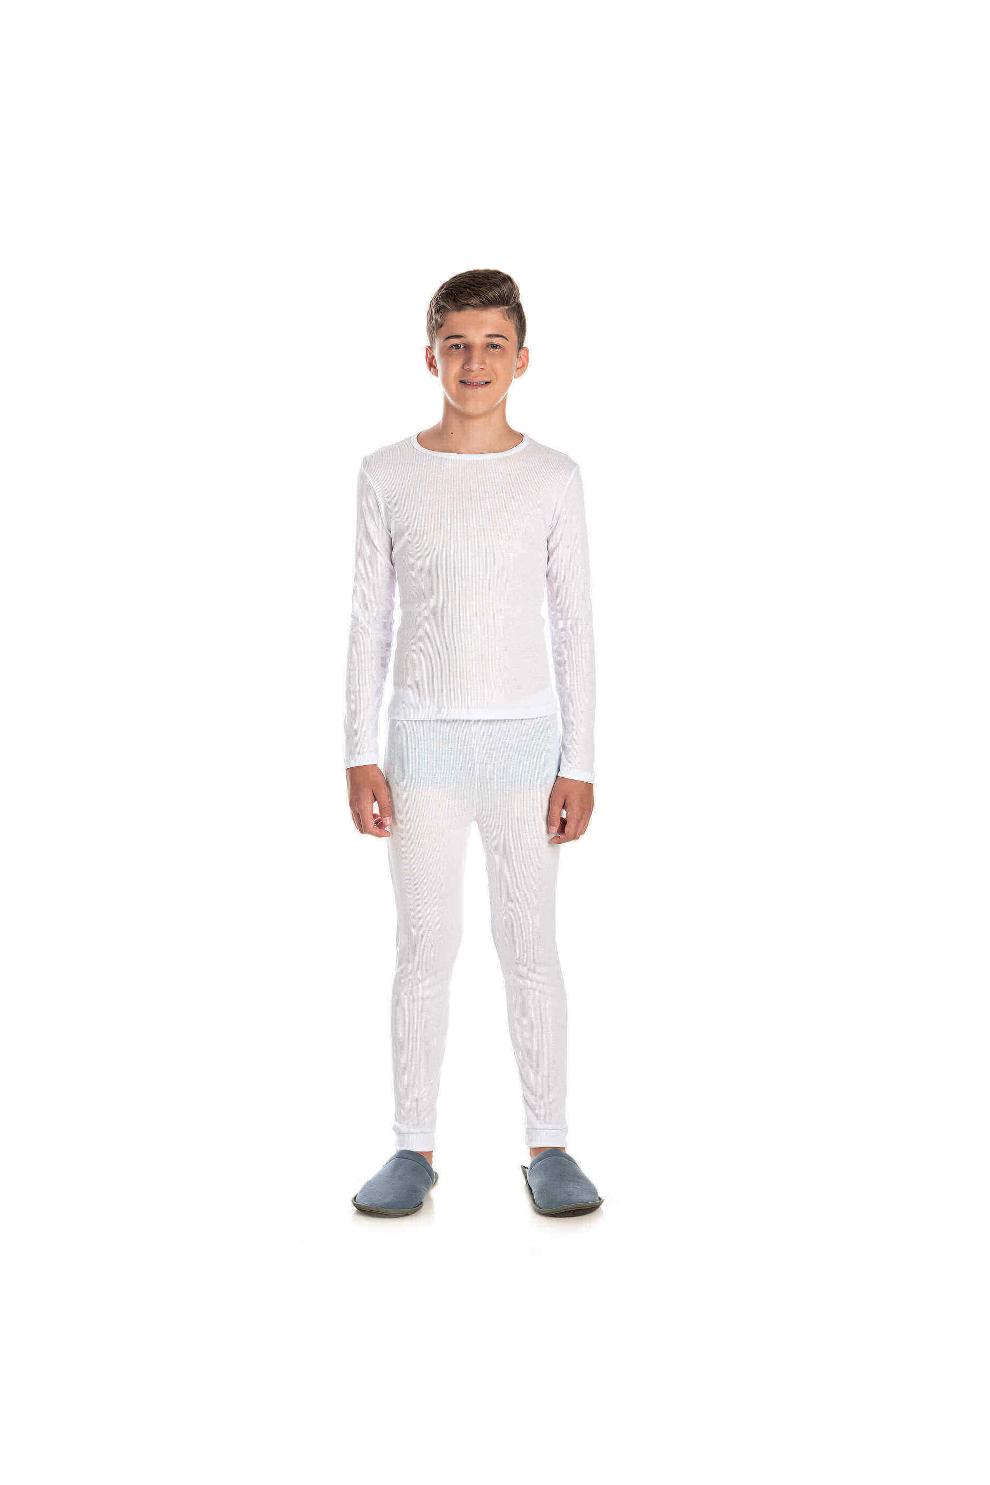 201/E - Calça Juvenil Unissex Underwear